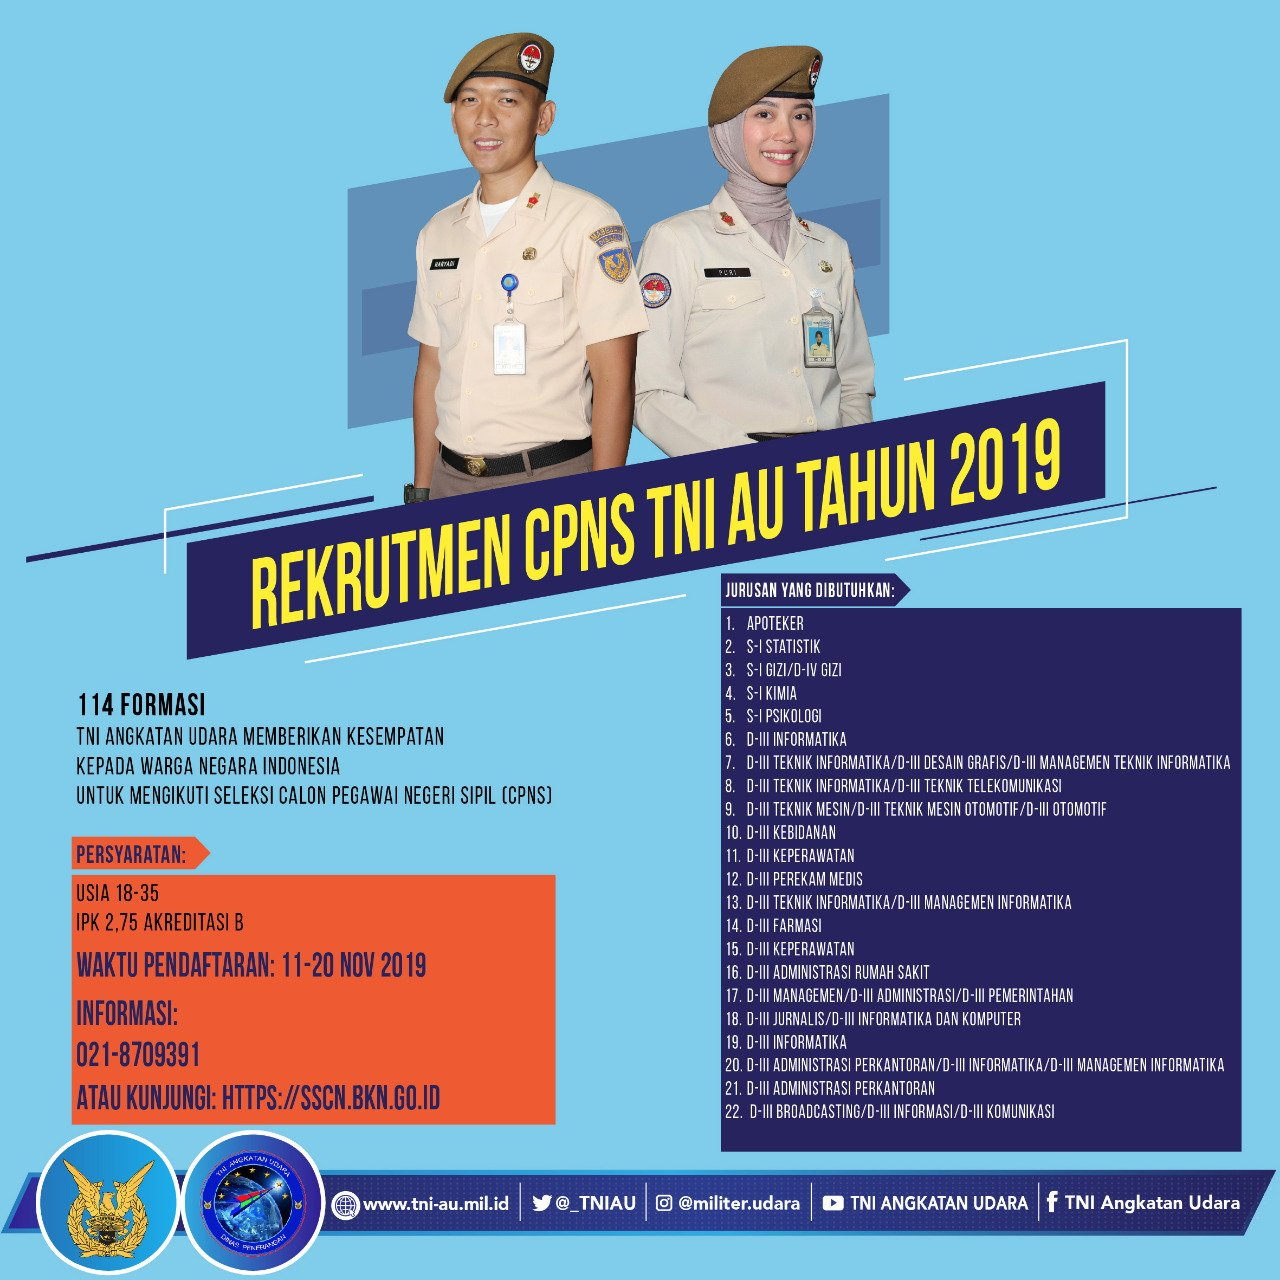 Pengumuman Rekrutmen CPNS TNI Angkatan Udara Tahun 2019